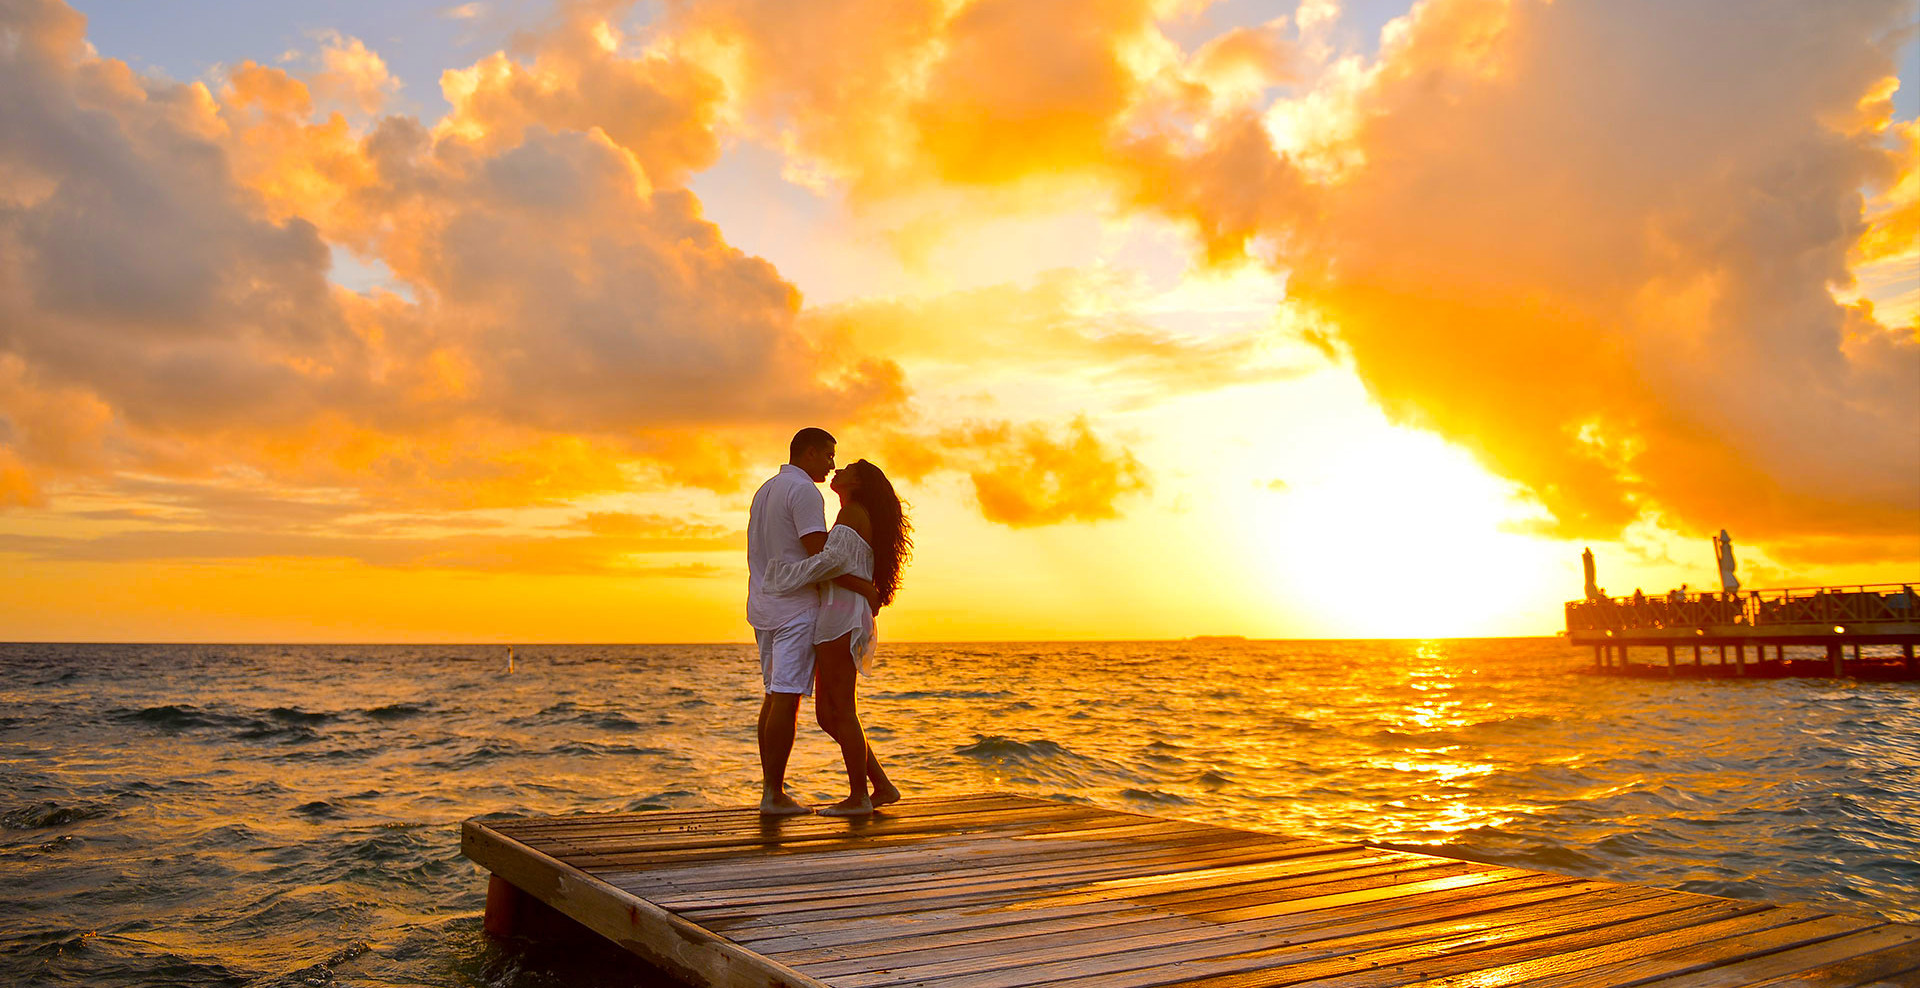 sunset-romantic-couple.jpg